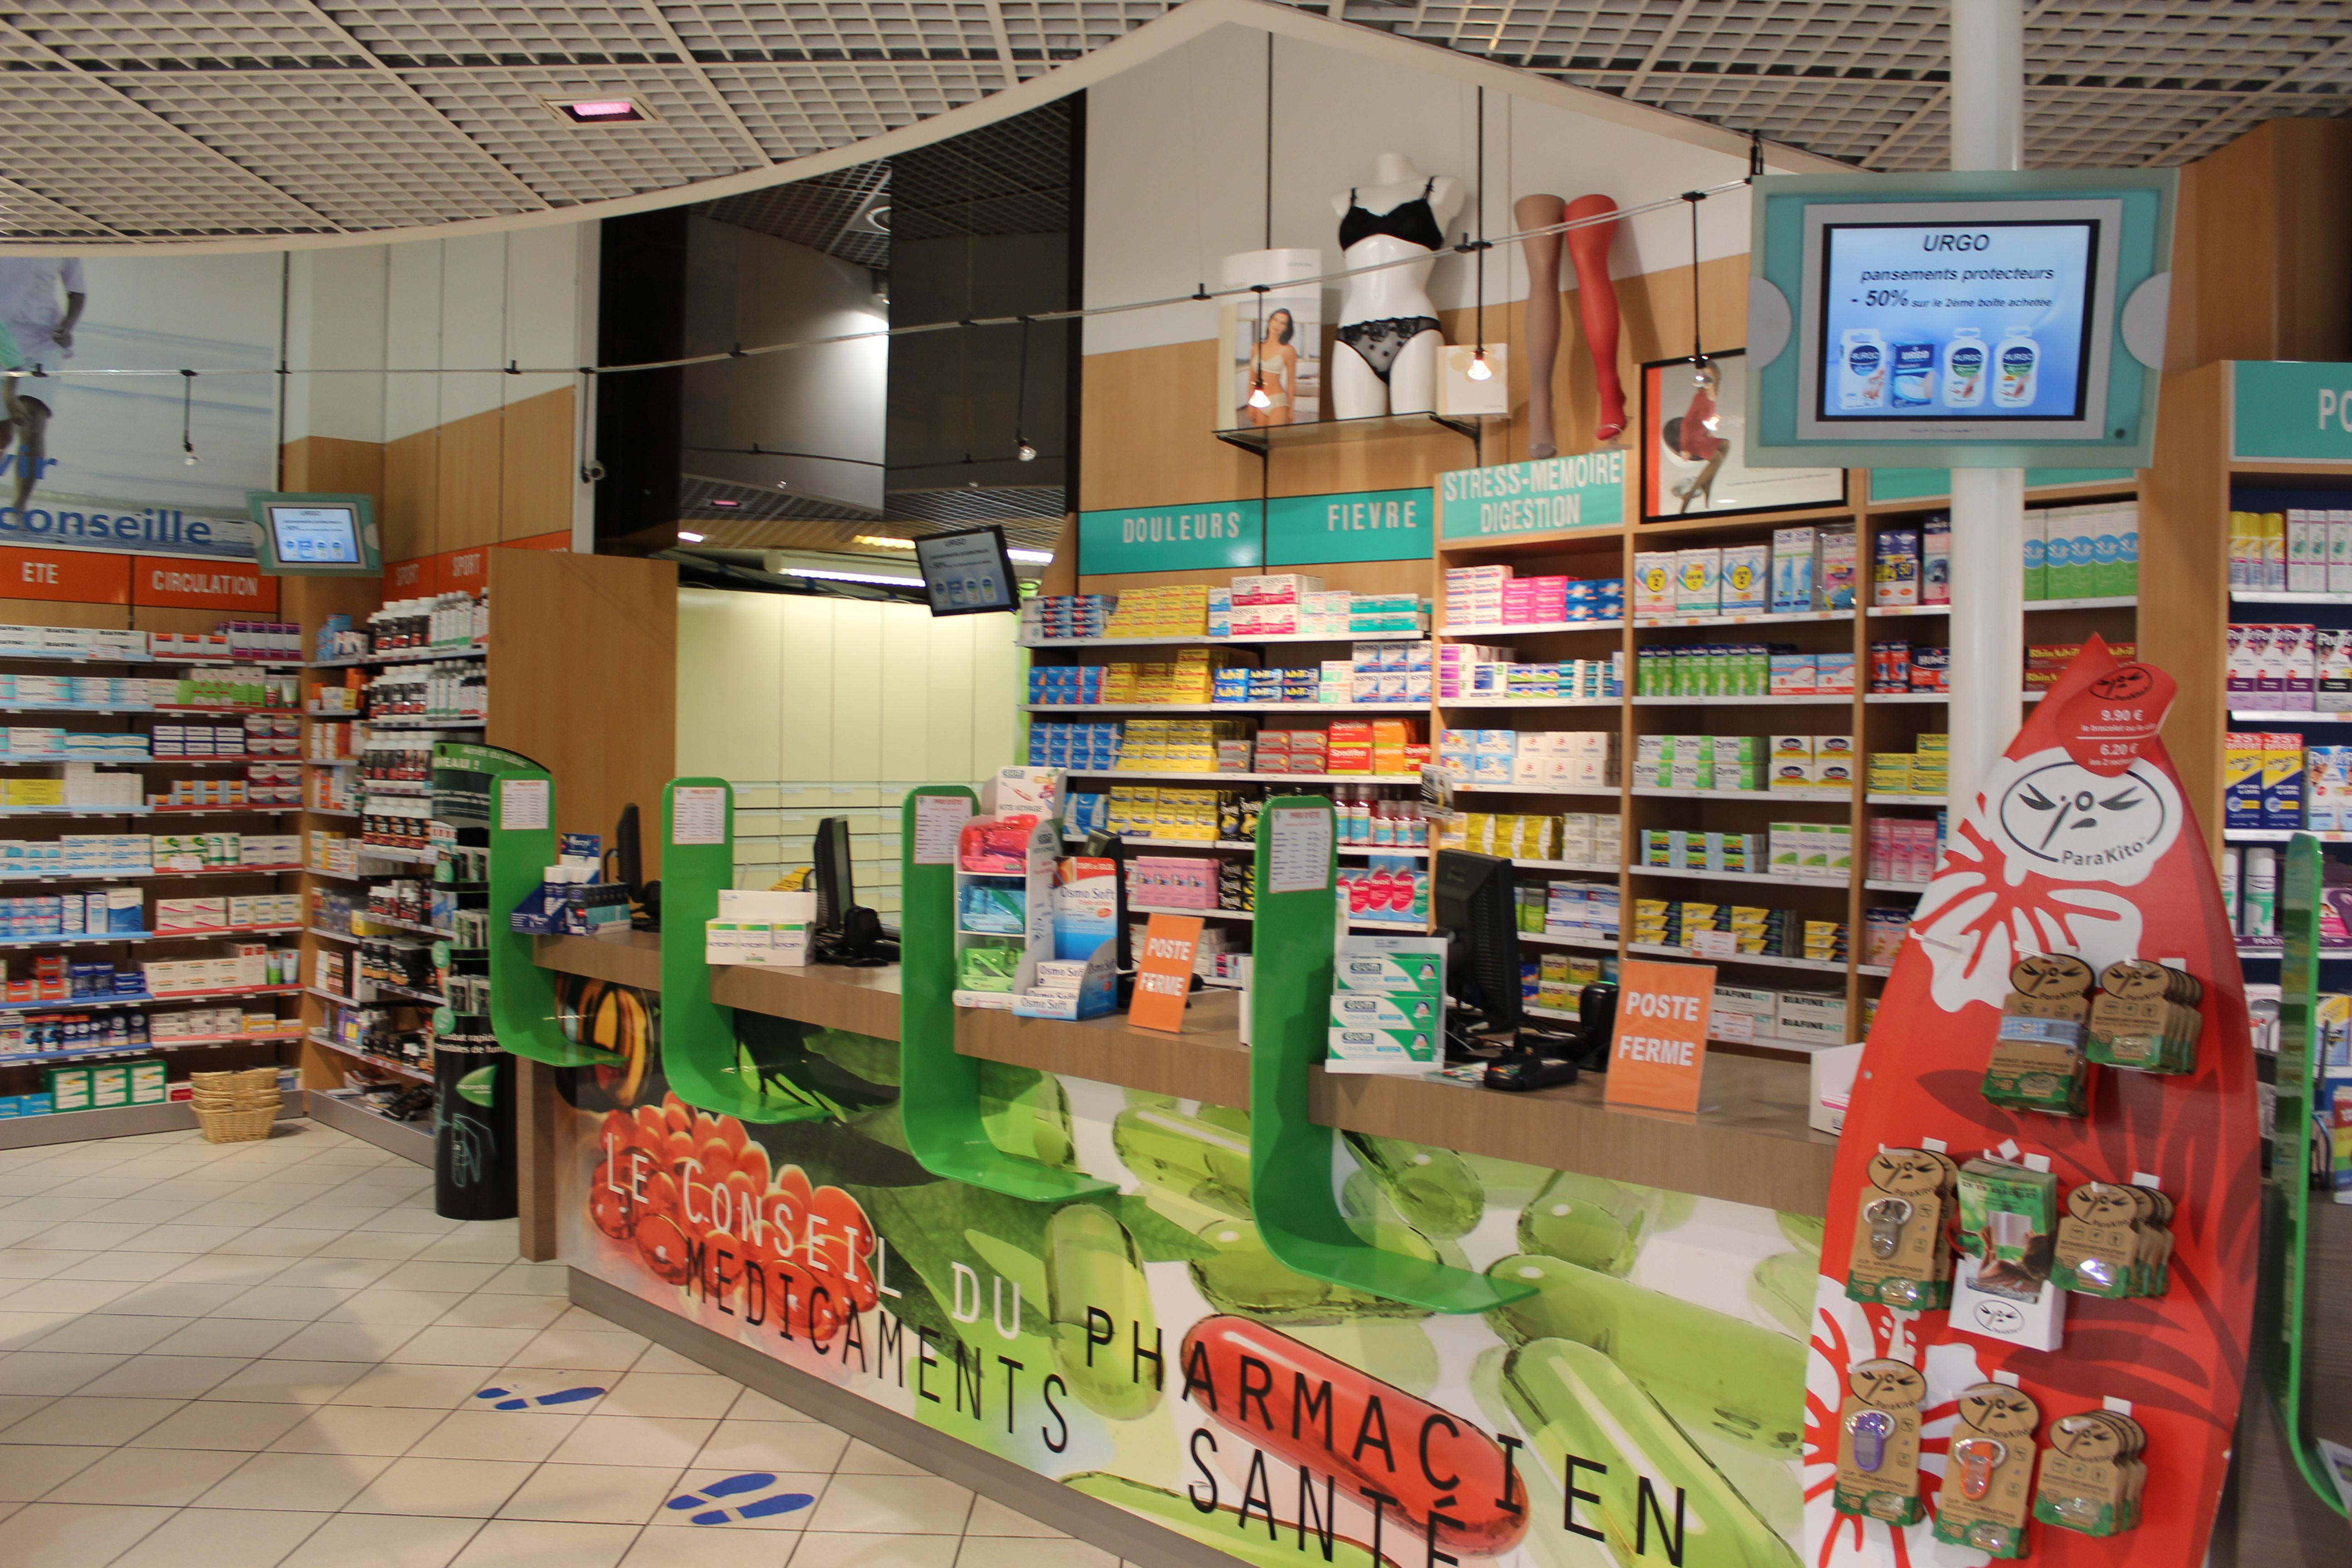 Pharmacie alpes provence bourg de p age accueil - Pharmacie garde salon de provence ...